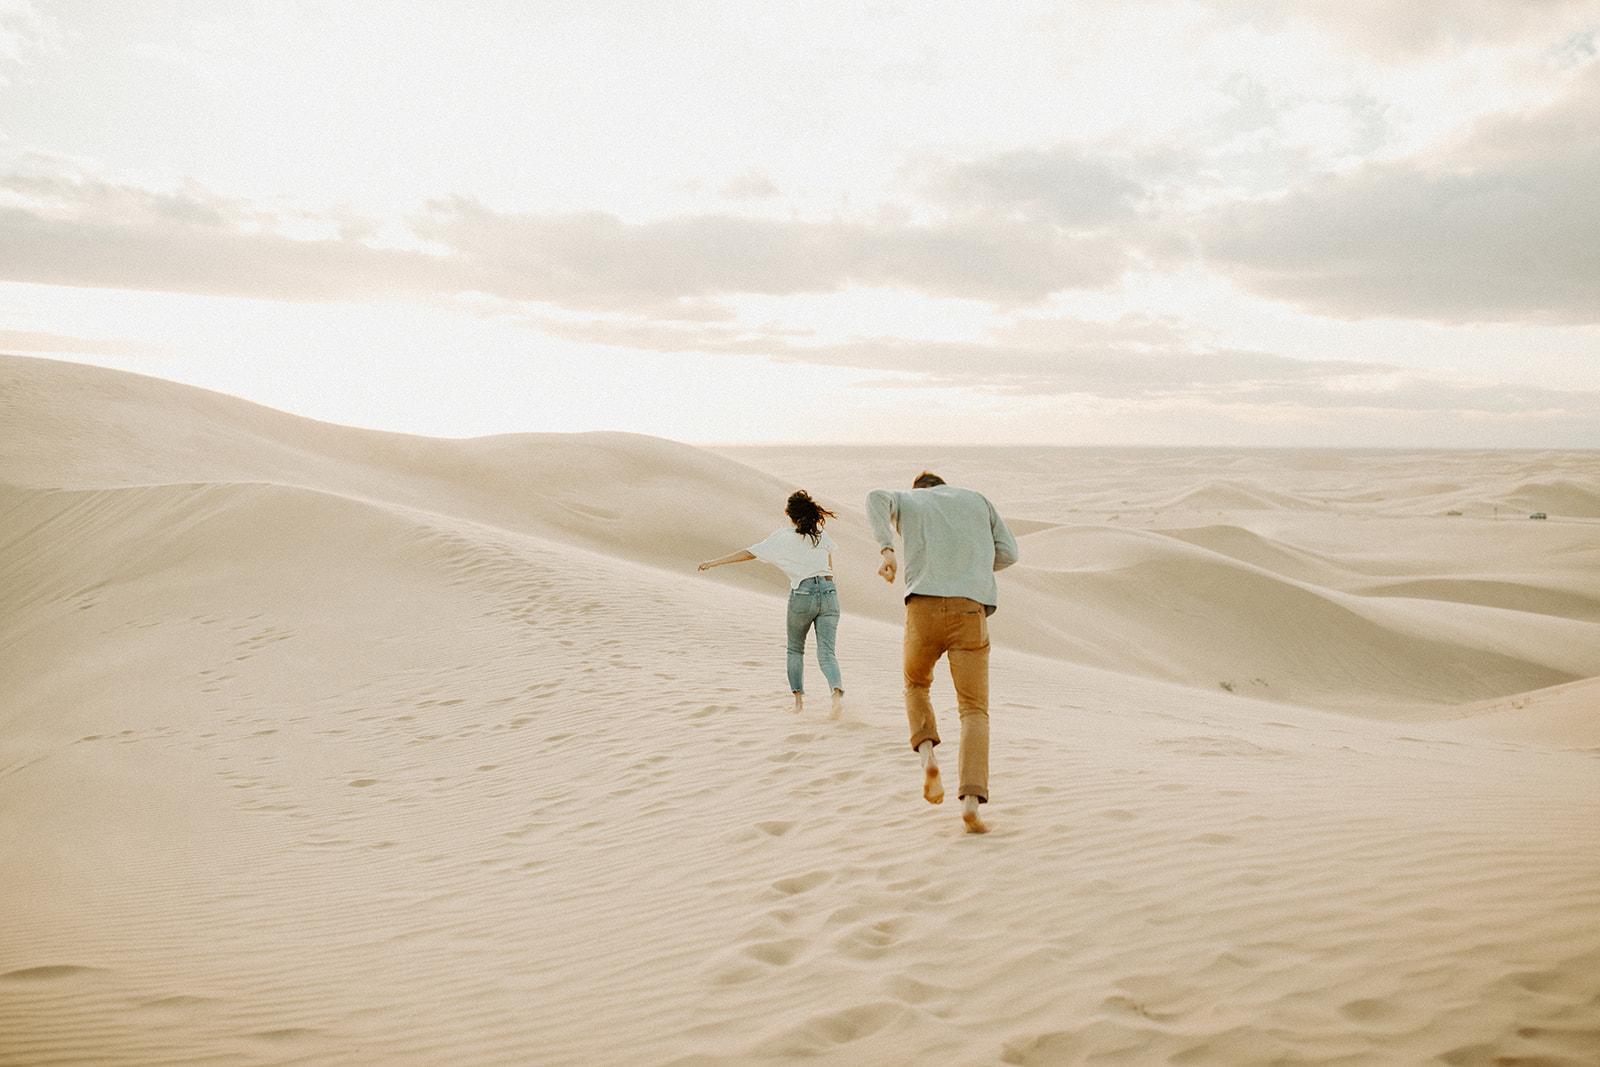 Imperial_Sand_Dunes_Linda_and_Sam_Dawn_Charles_Photographer-2.jpg